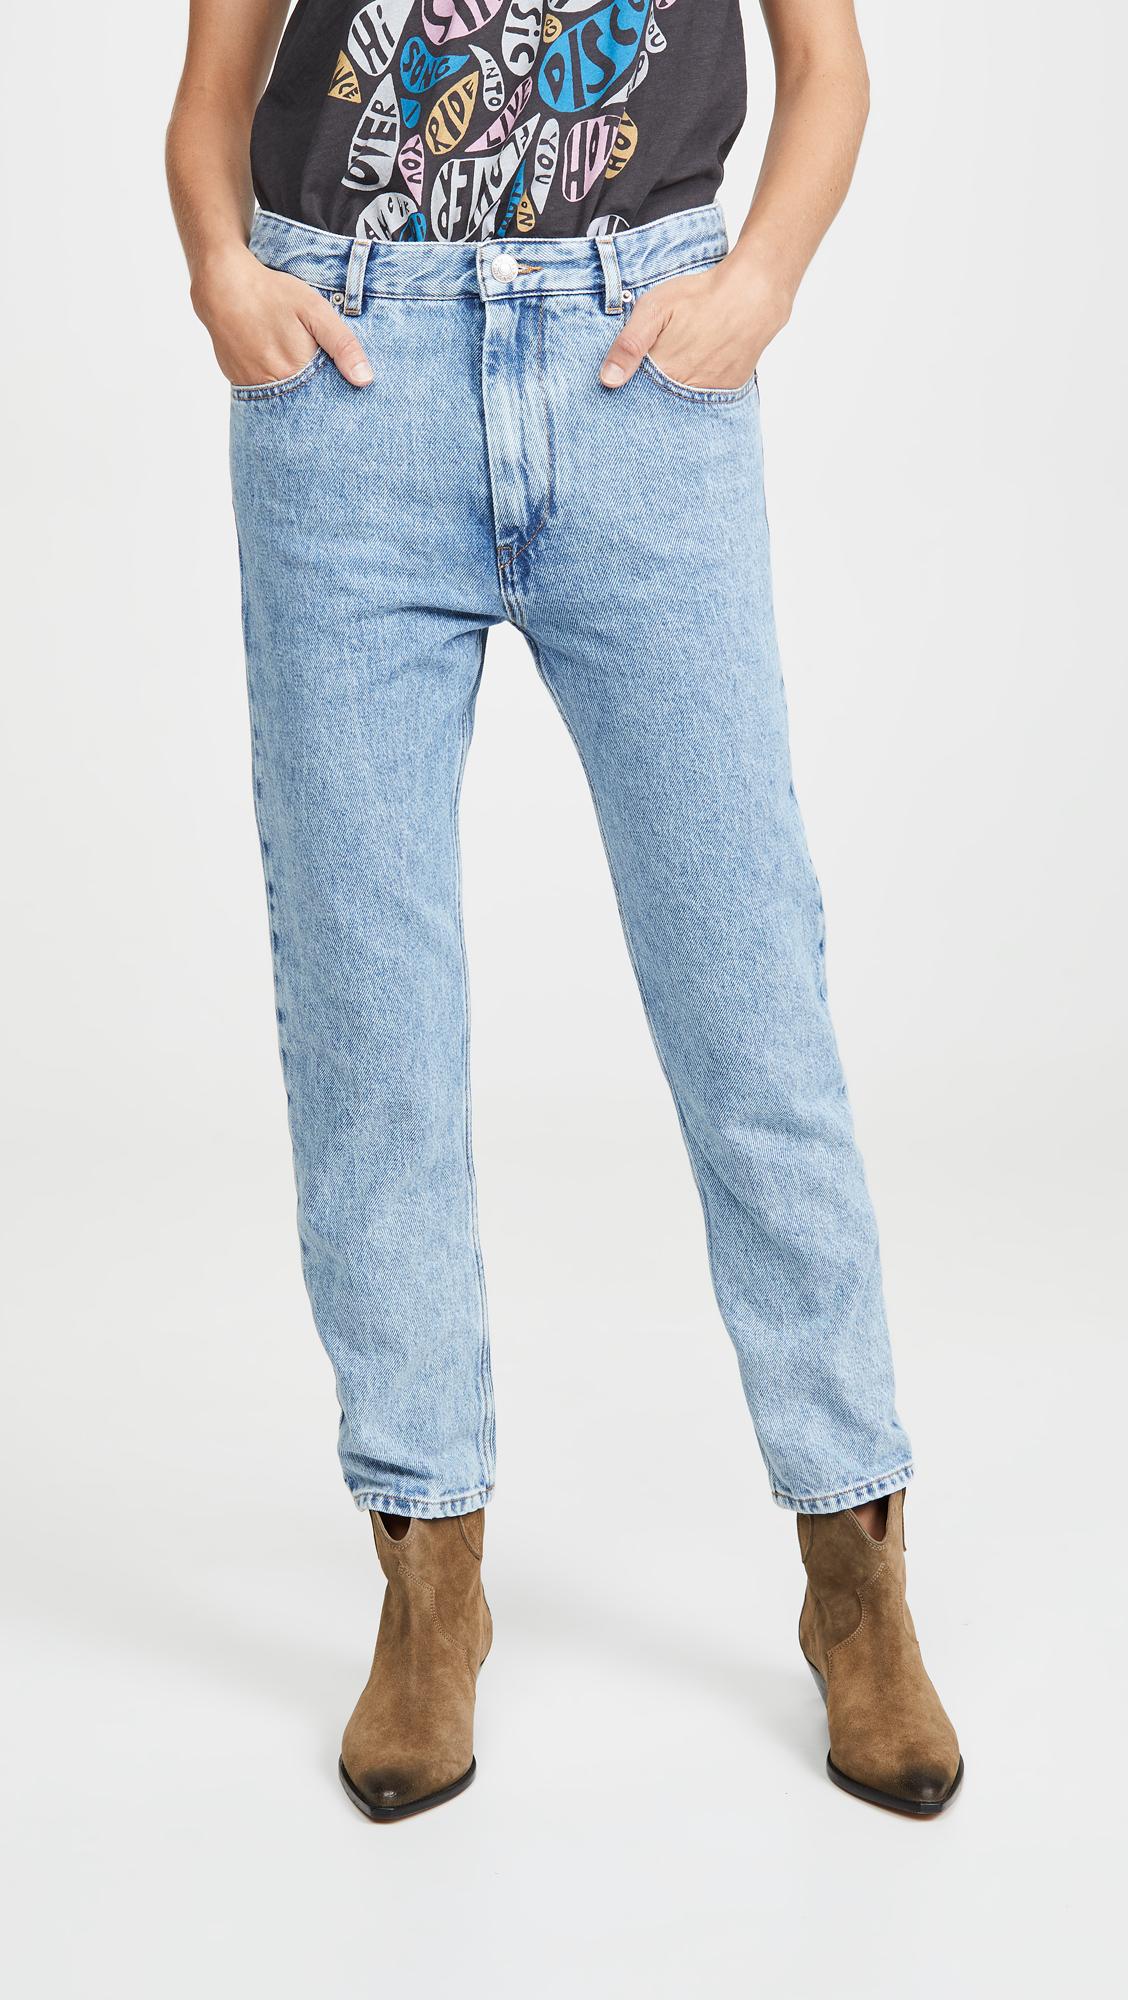 Isabel Marant Etoile Neaj Jeans Shopbop Save Up To 25 Use